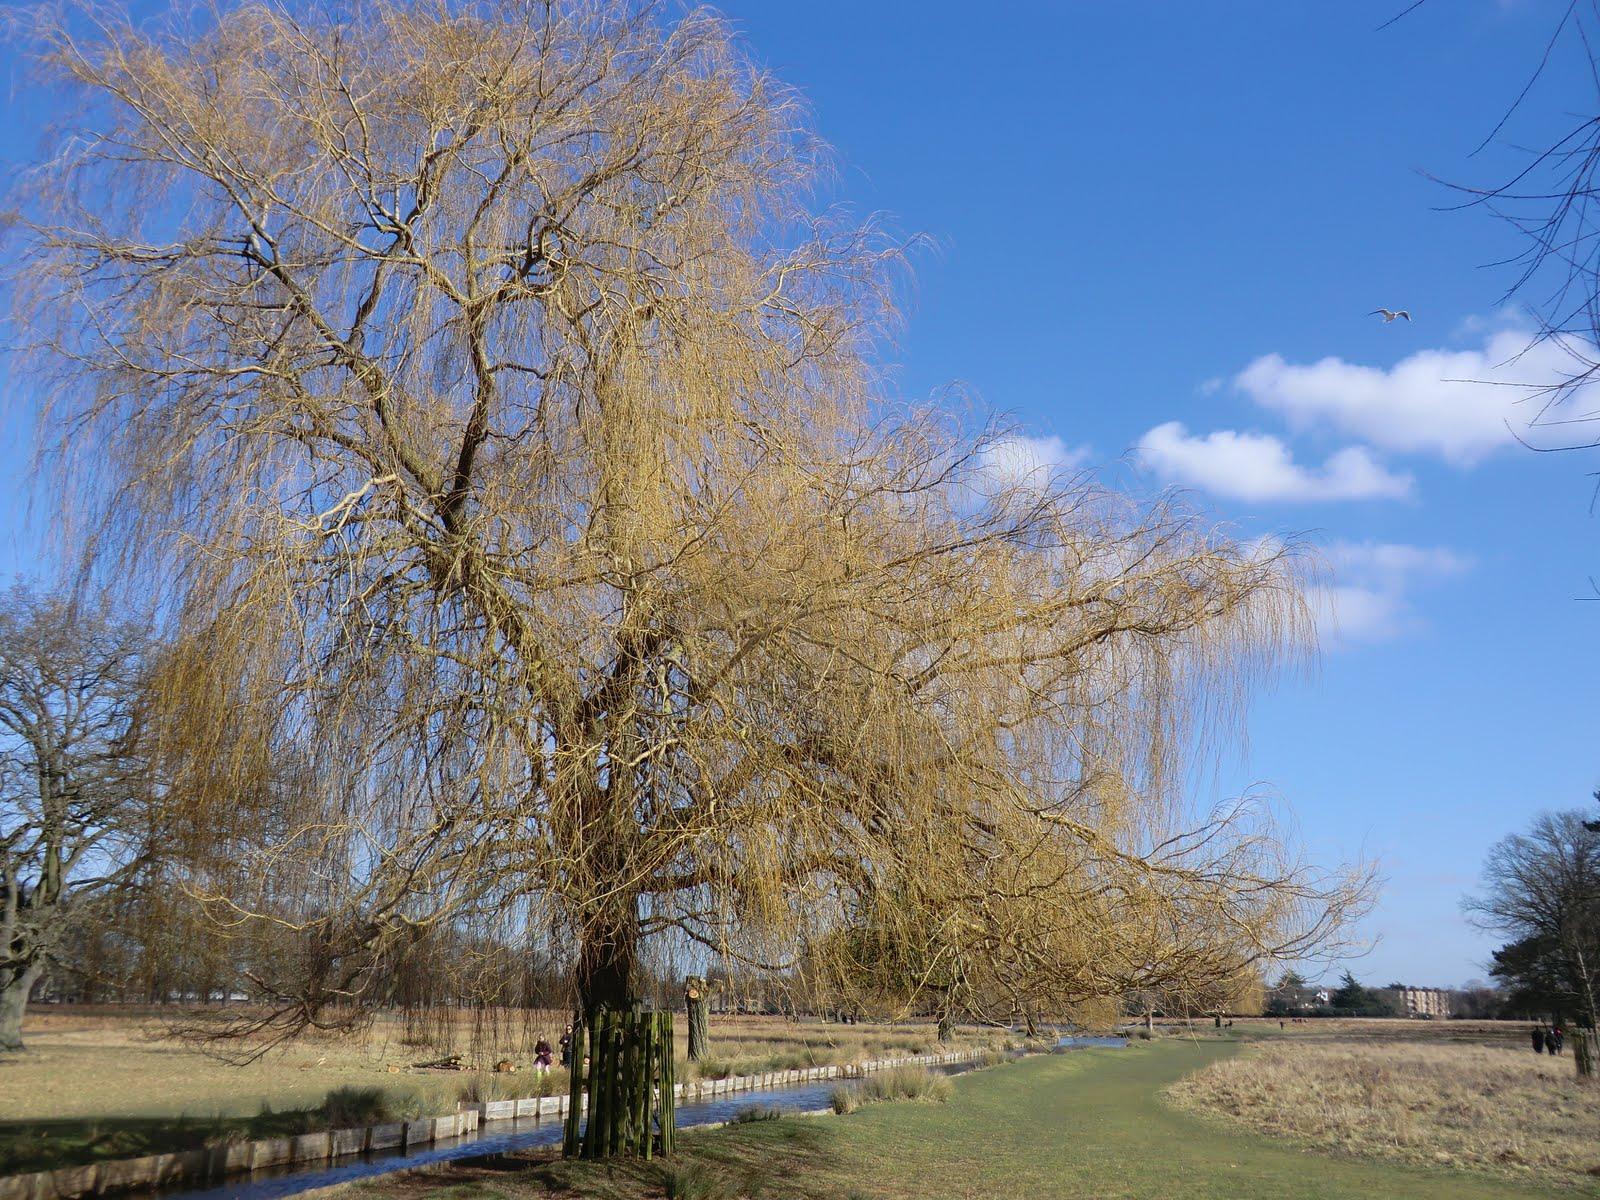 CIMG6720 Willow trees in winter, Bushy Park